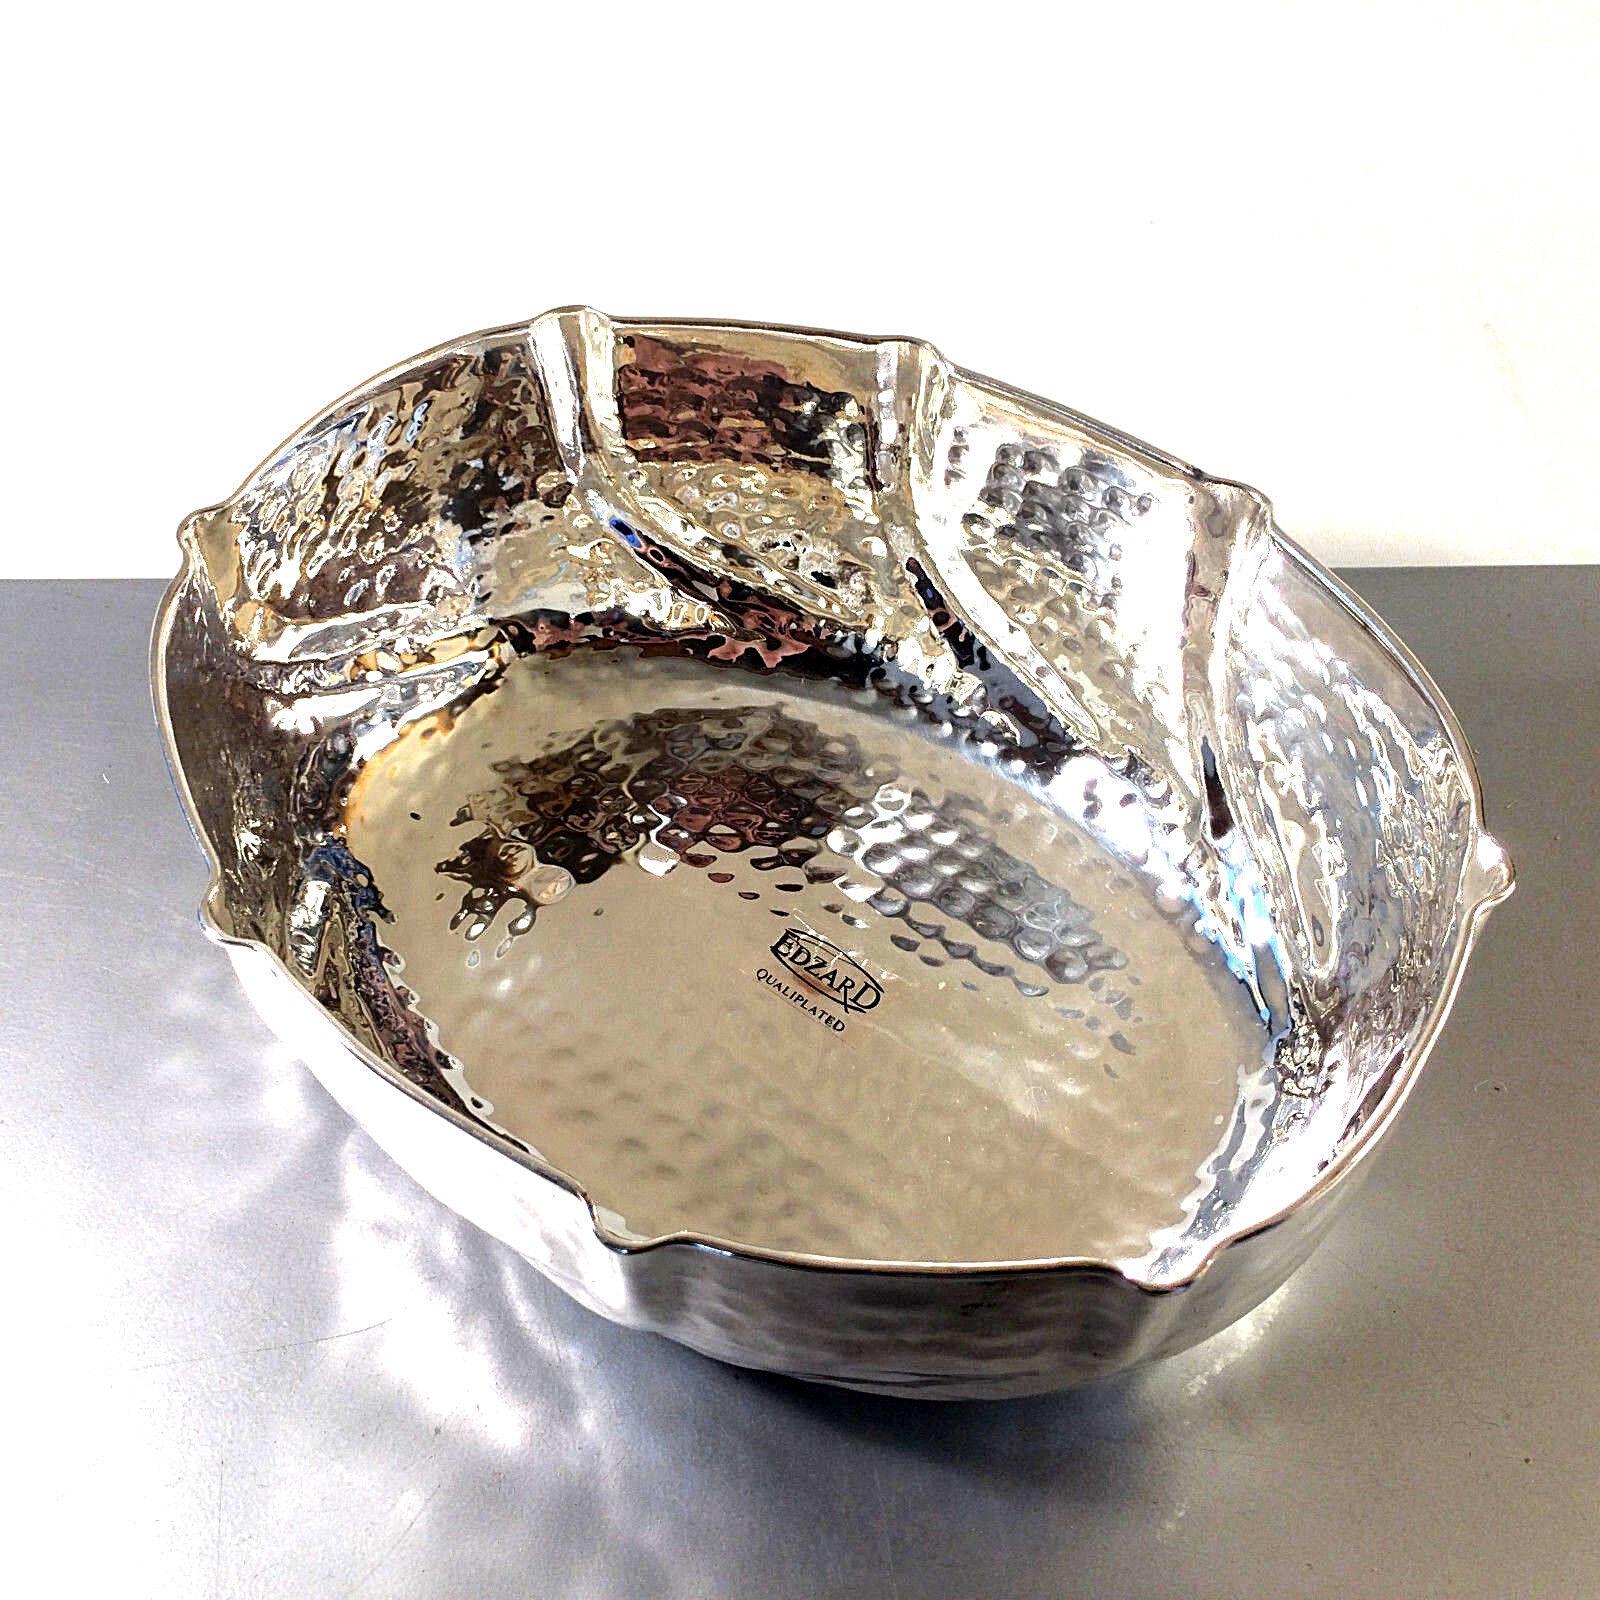 (a57) EDZARD versilberte Schale Schüssel 19 x 23,5 cm Vintage 60er Silber